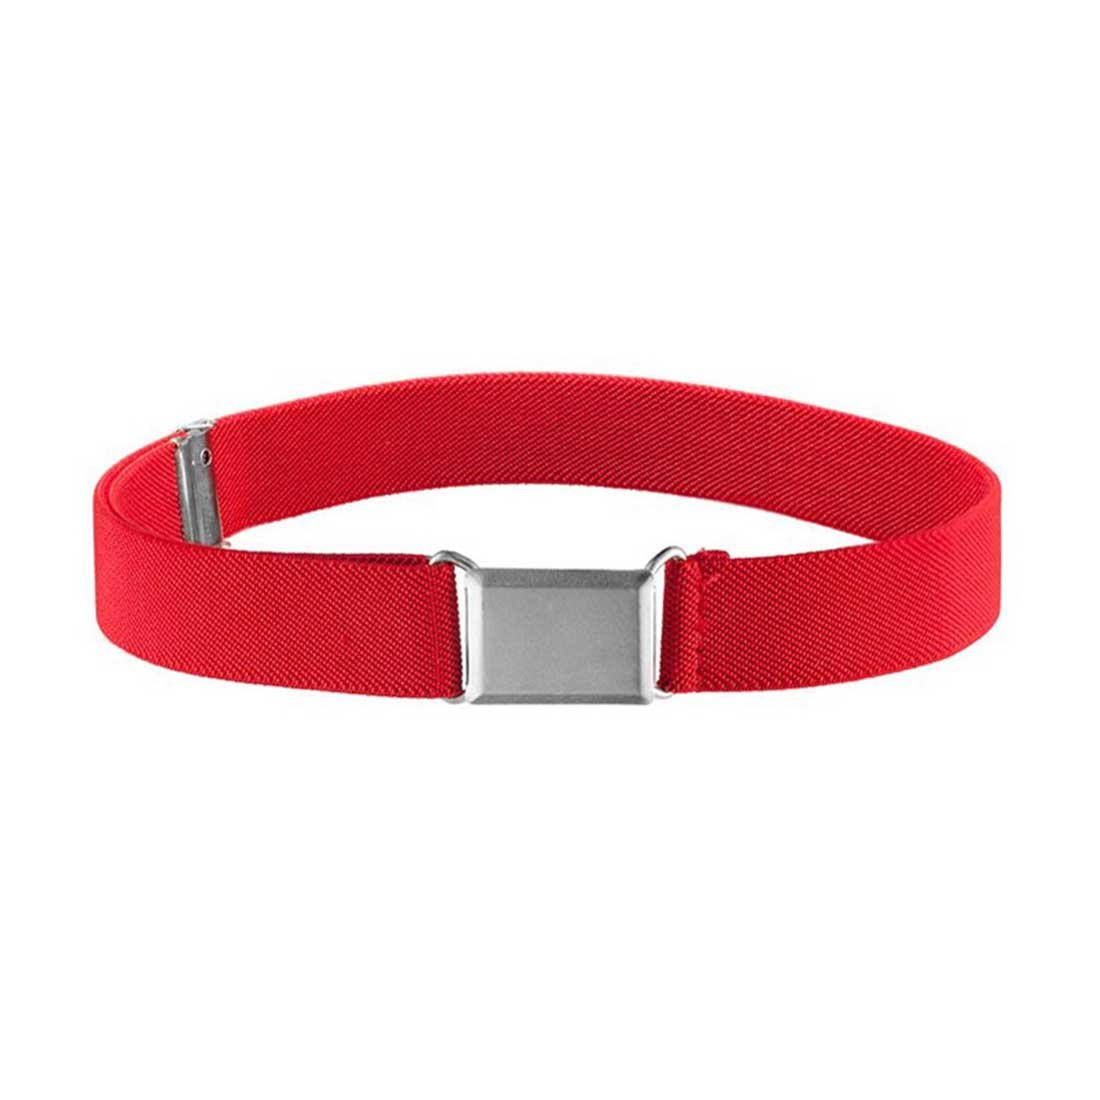 Romanlin Kids Belt Solid Color Adjustable Elastic Belt with Silver Buckle